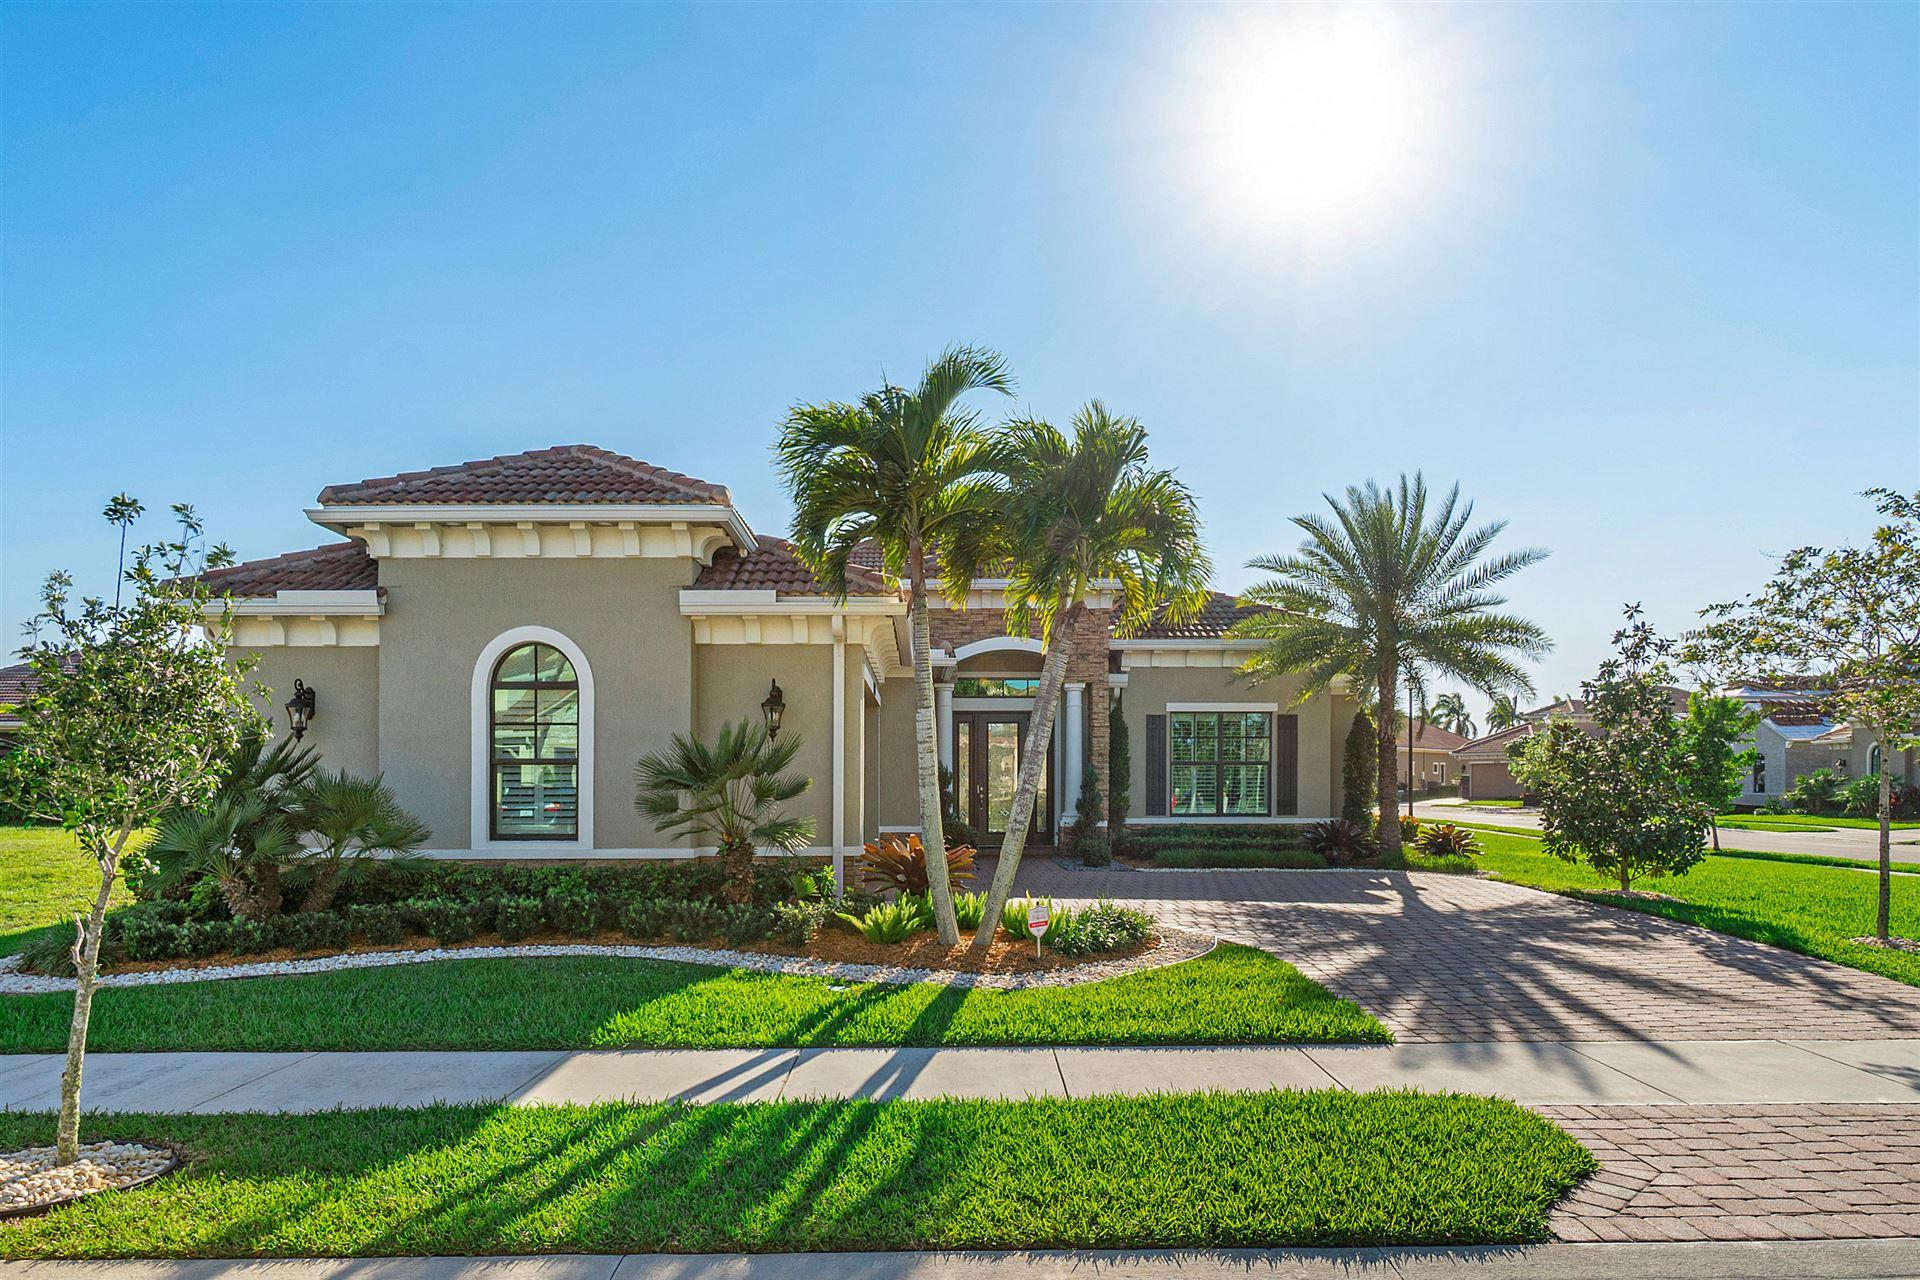 11930 Palermo Road, Parkland, FL 33076 - #: RX-10605774